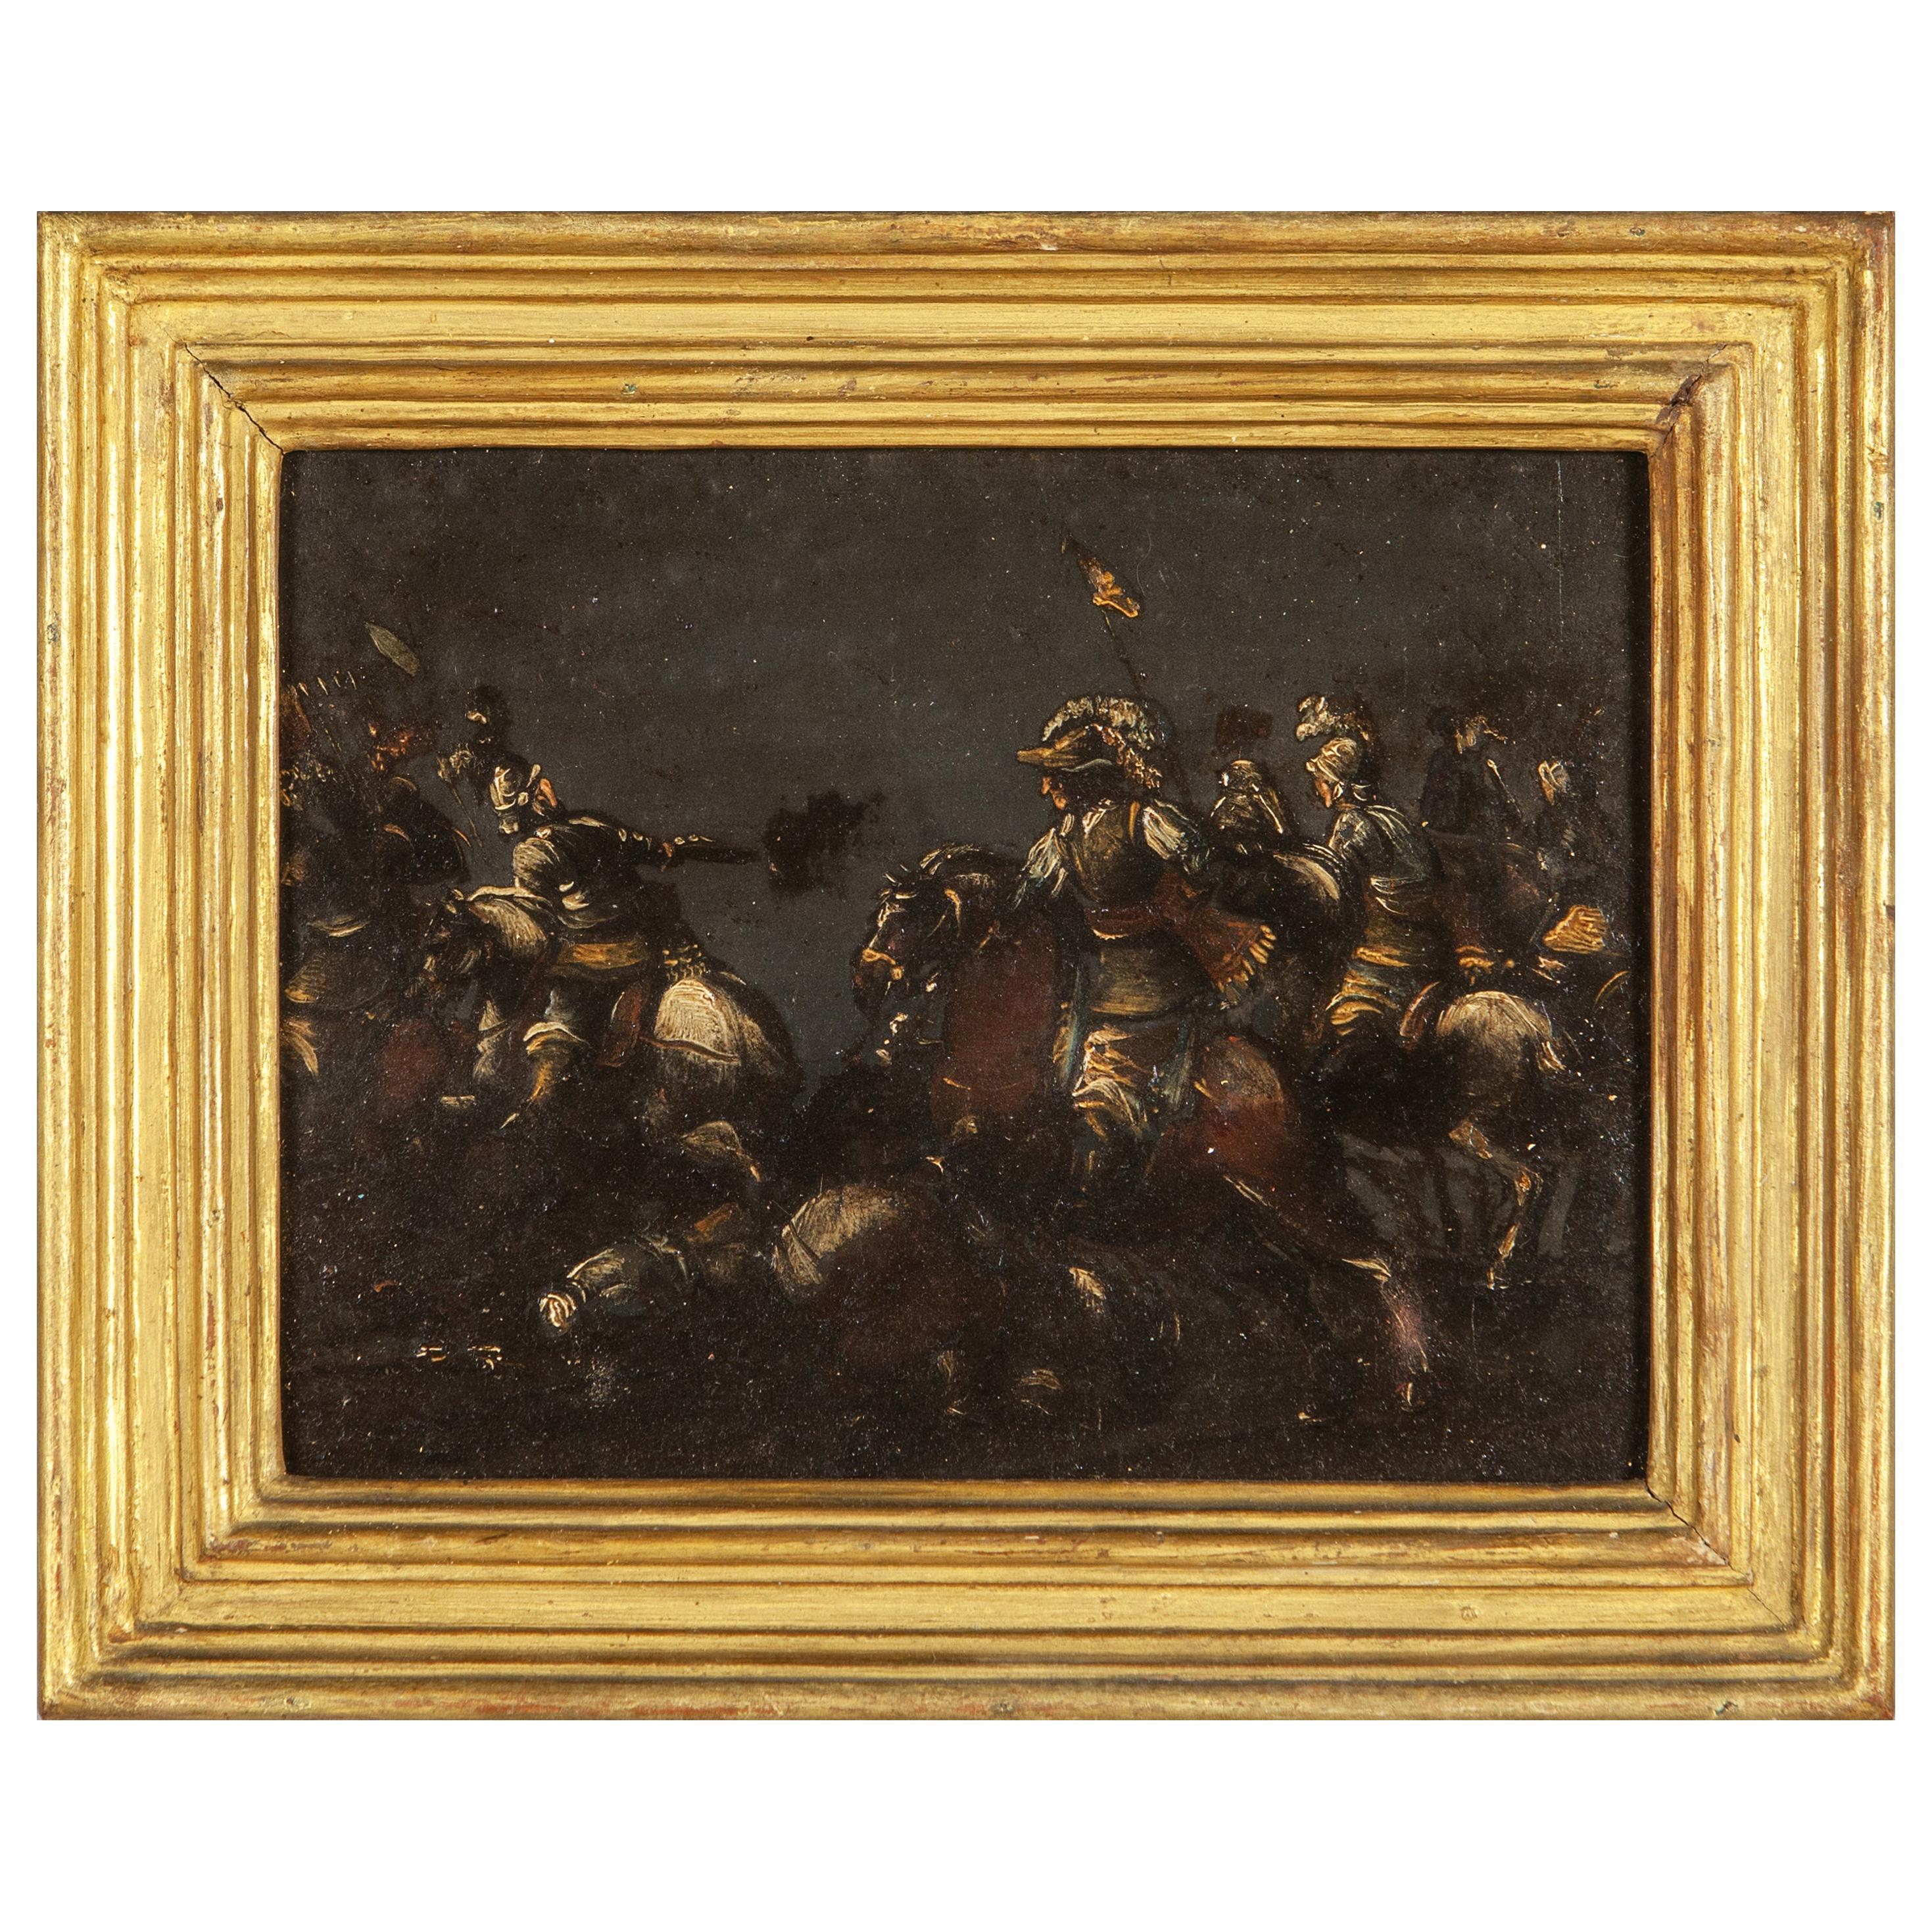 17th Century, Italian Oil on Slate Painting with A Cavalry Battle Scene